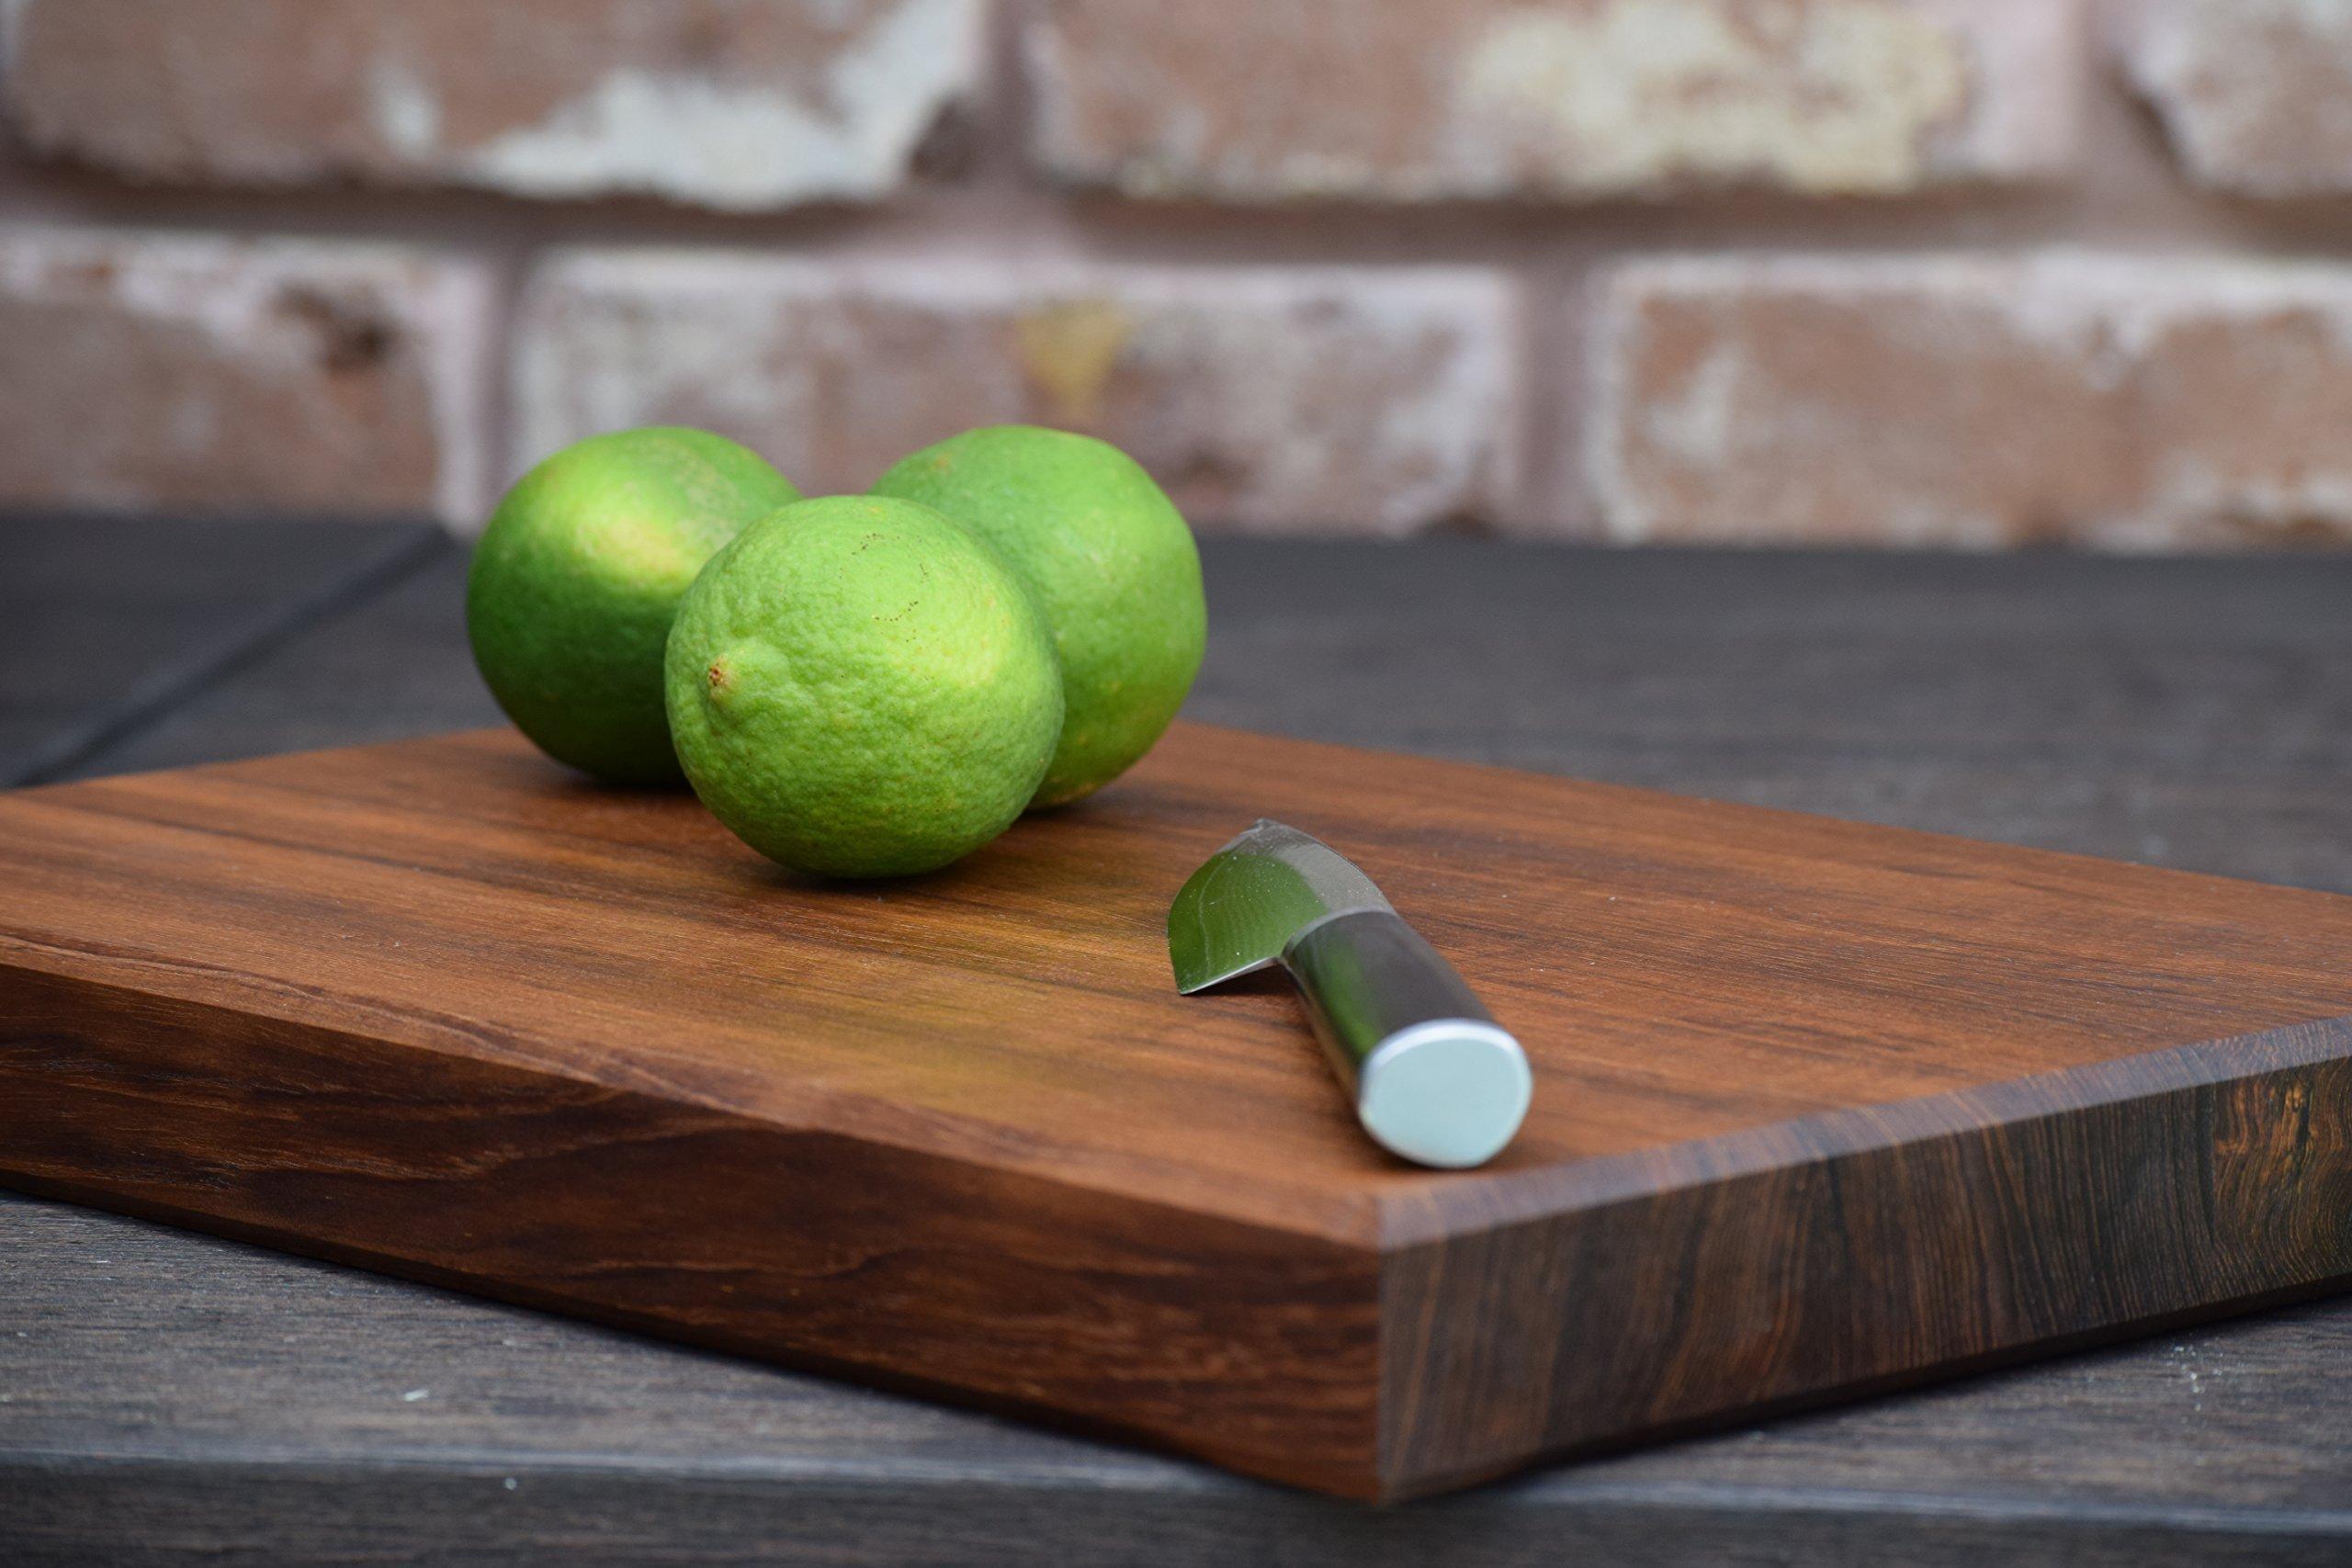 Teak Wood Edge Grain Cutting Board Handmade Reversible Butcher Block by The Practical Plankist (Image #5)